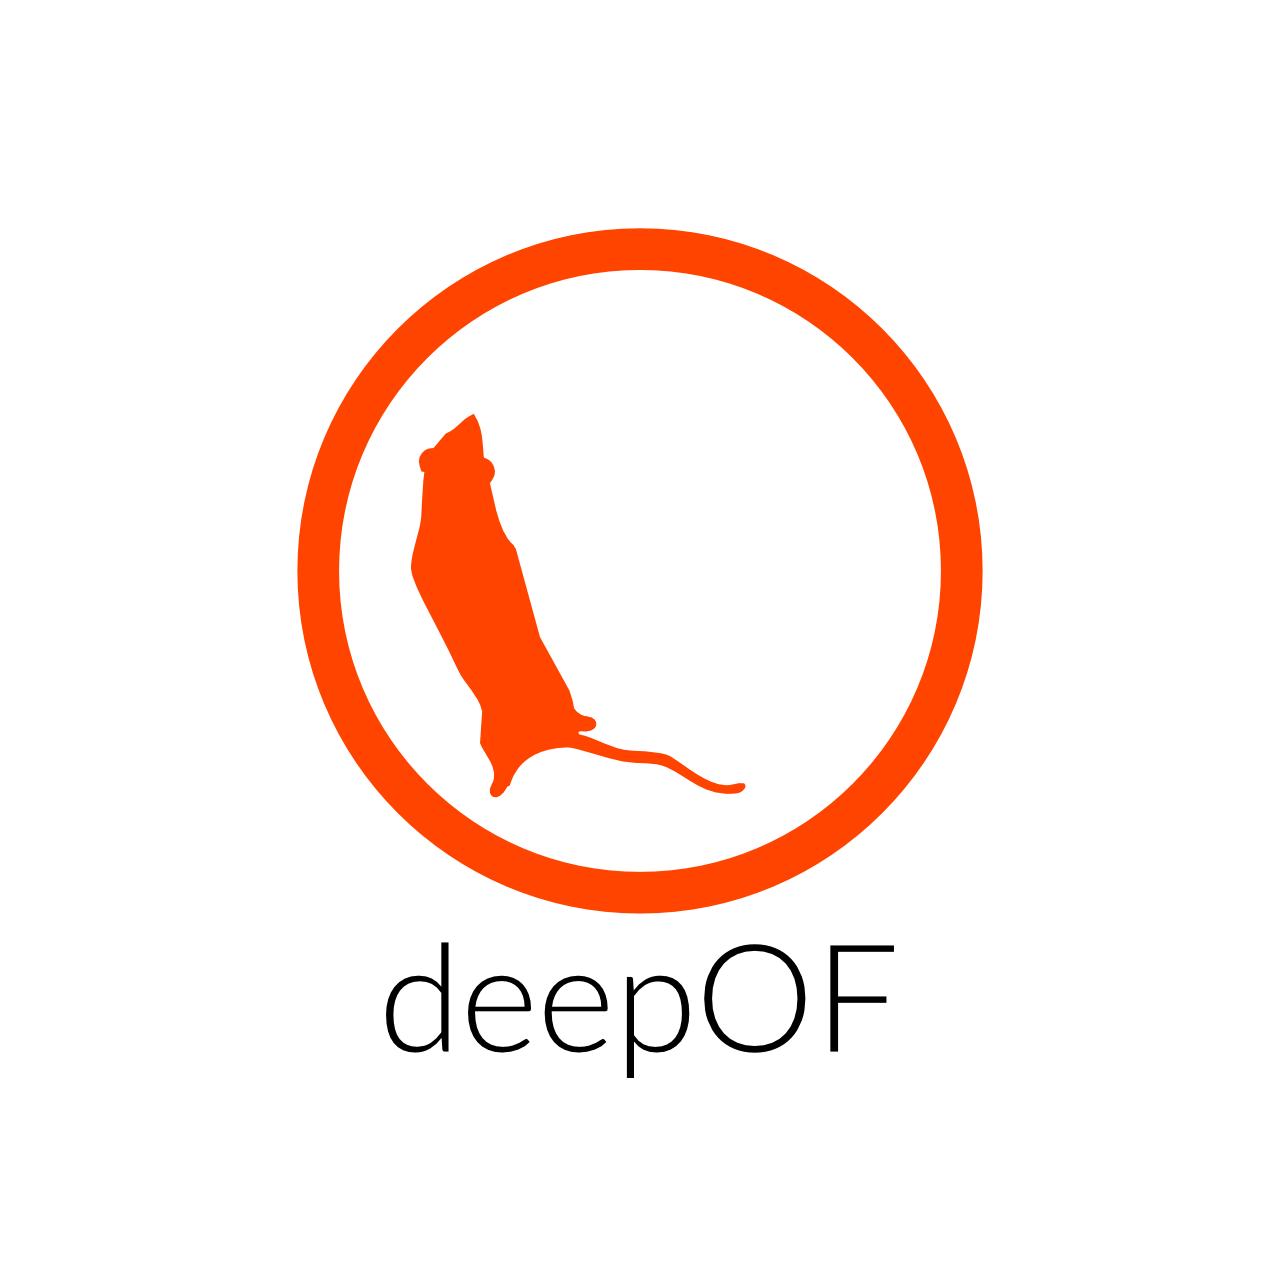 logos/deepOF_logo_w_text.png